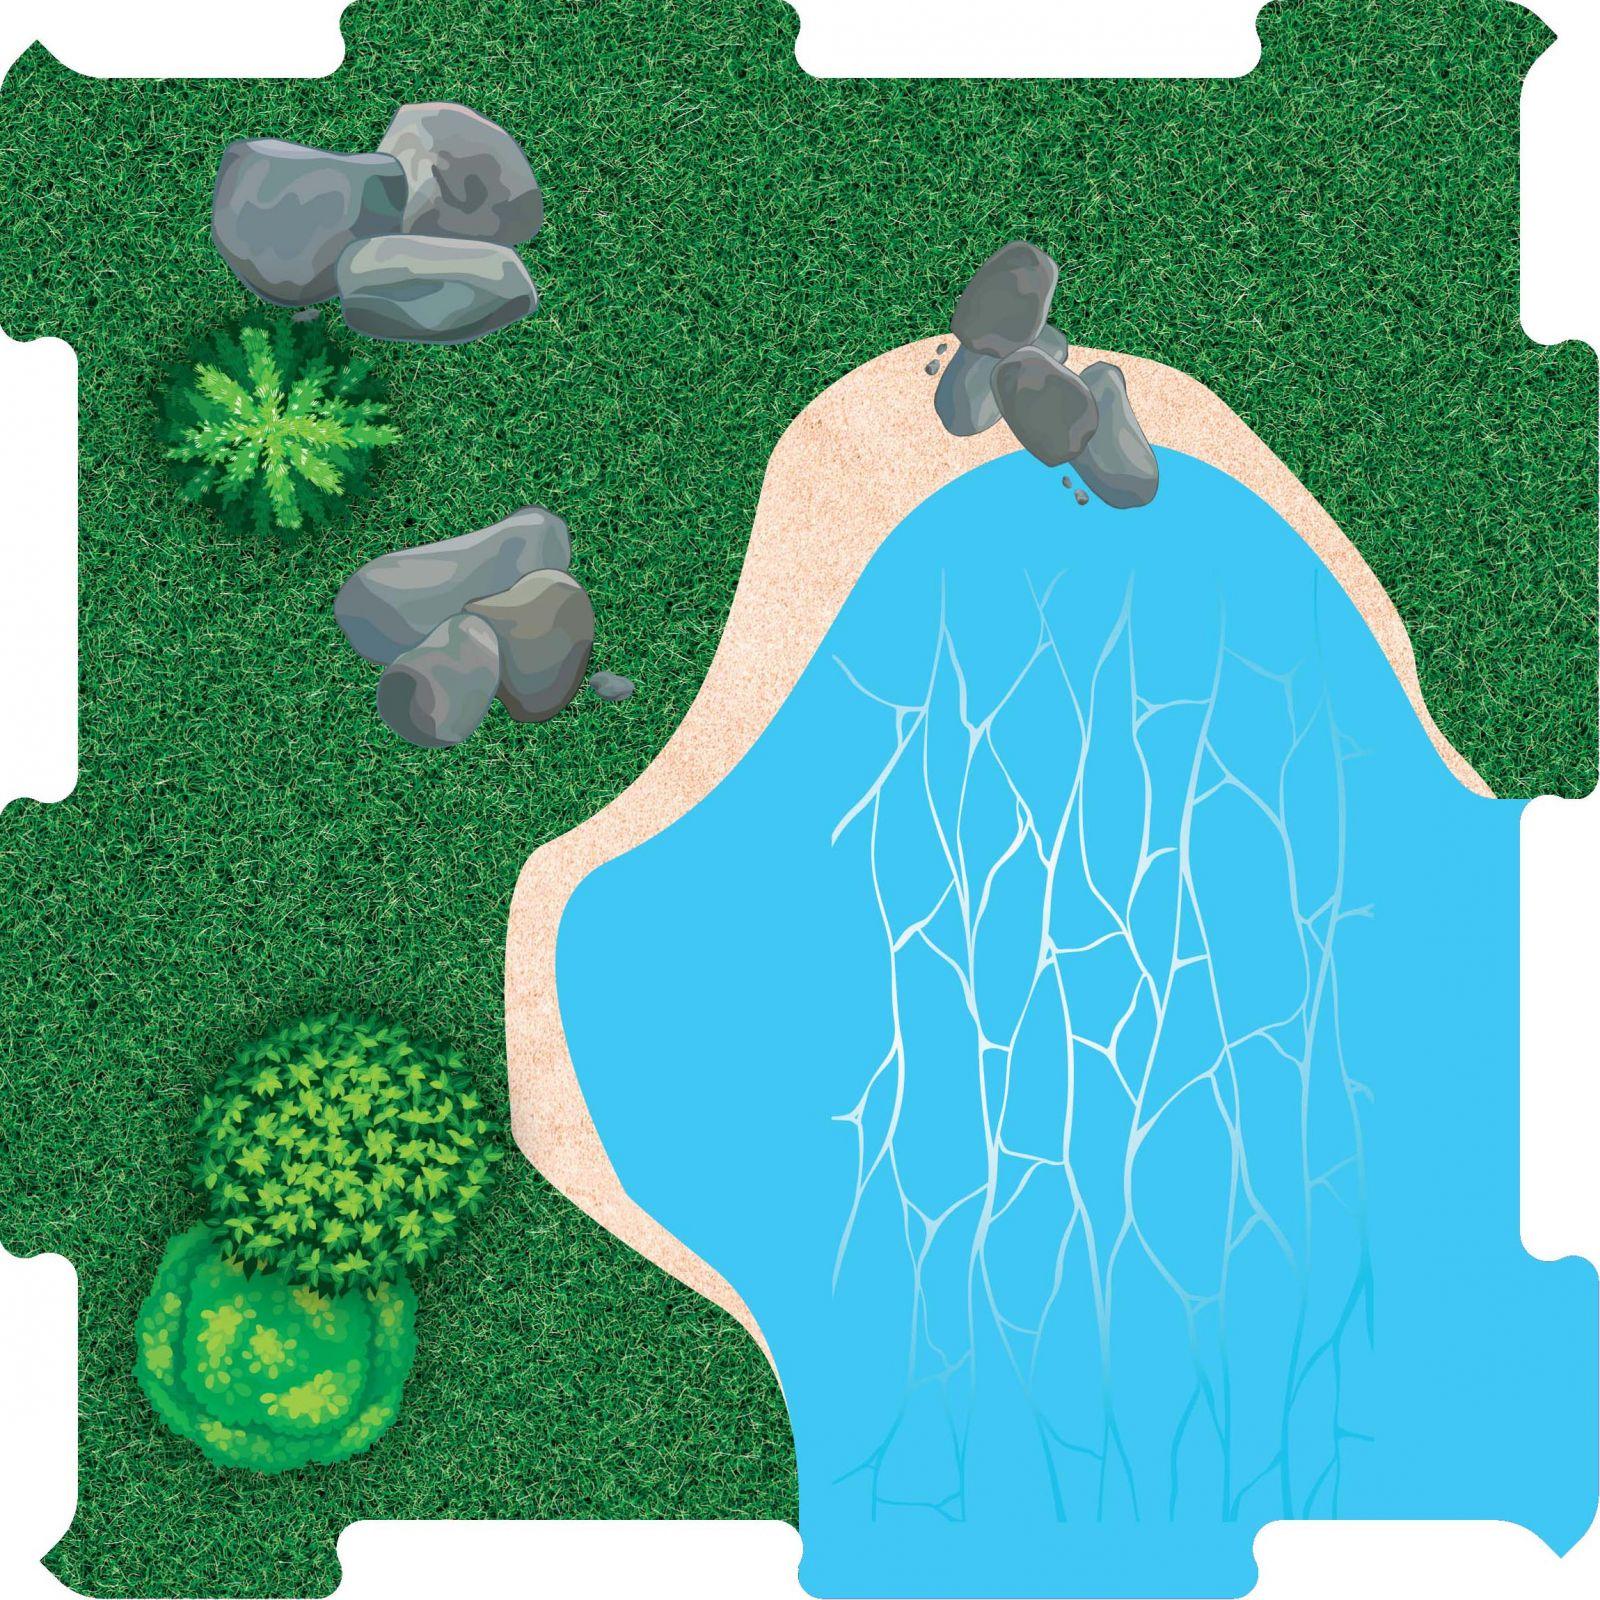 Podlahove puzzle voda roh vetsi